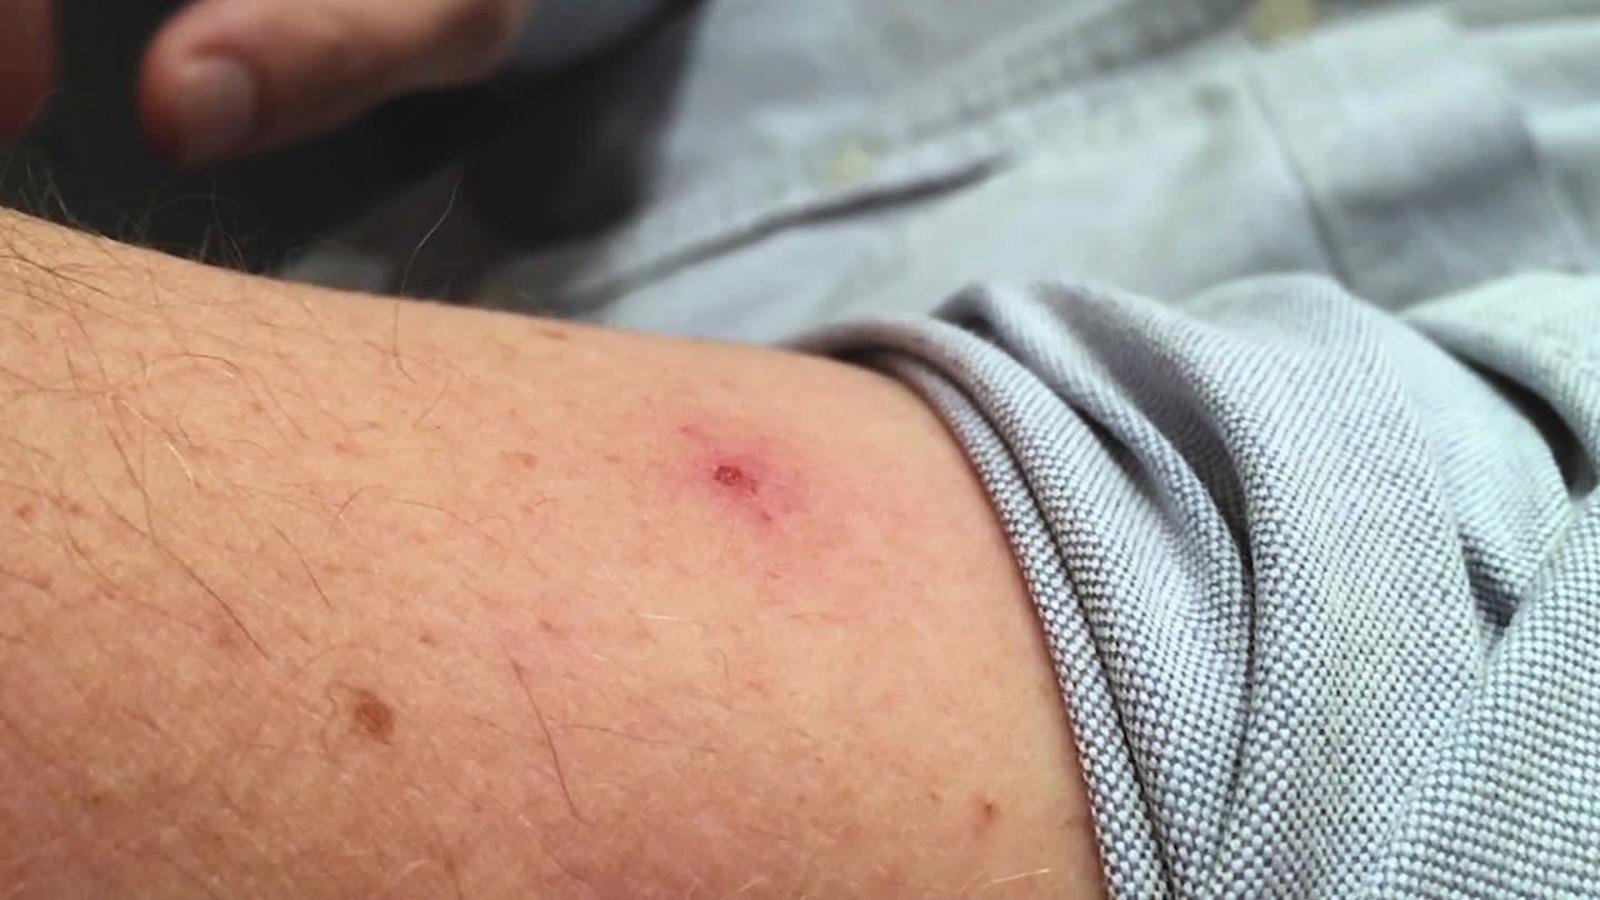 Mosquito Biting A Human